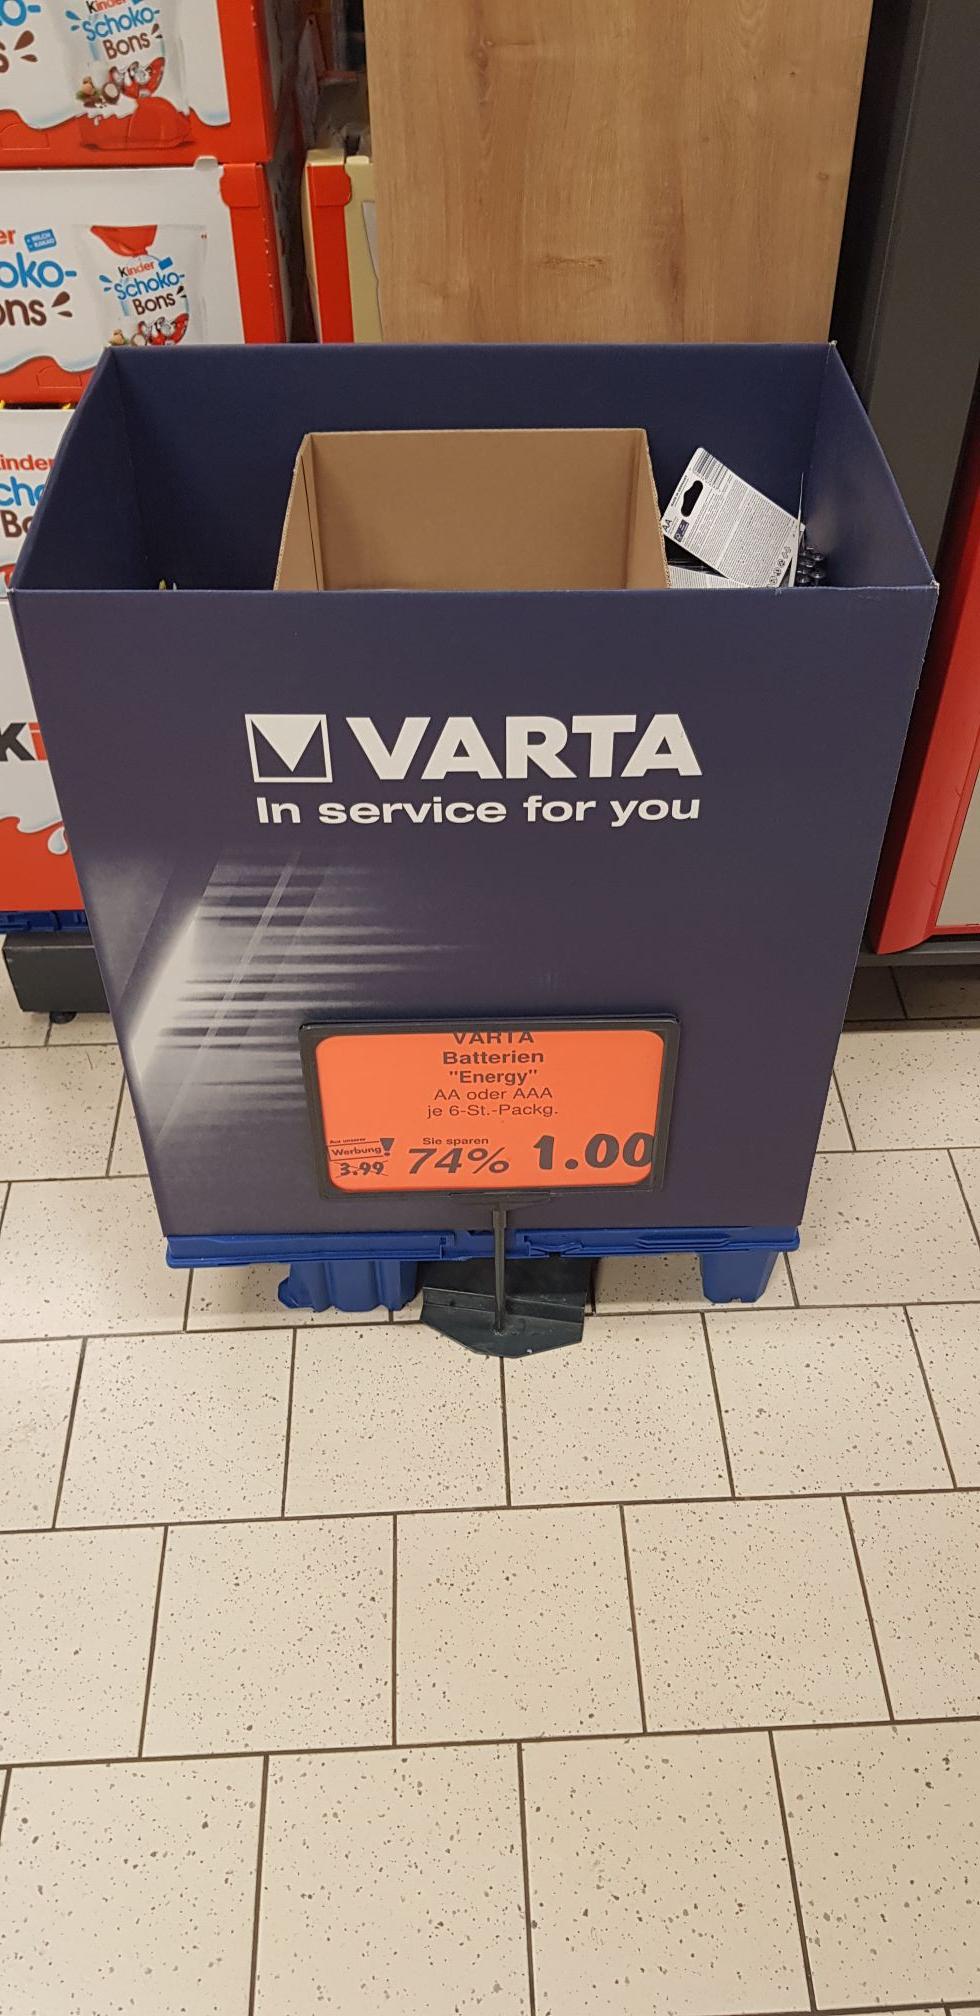 [Lokal Potsdam]VARTA AA- & AAA-Batterien 6er Packung